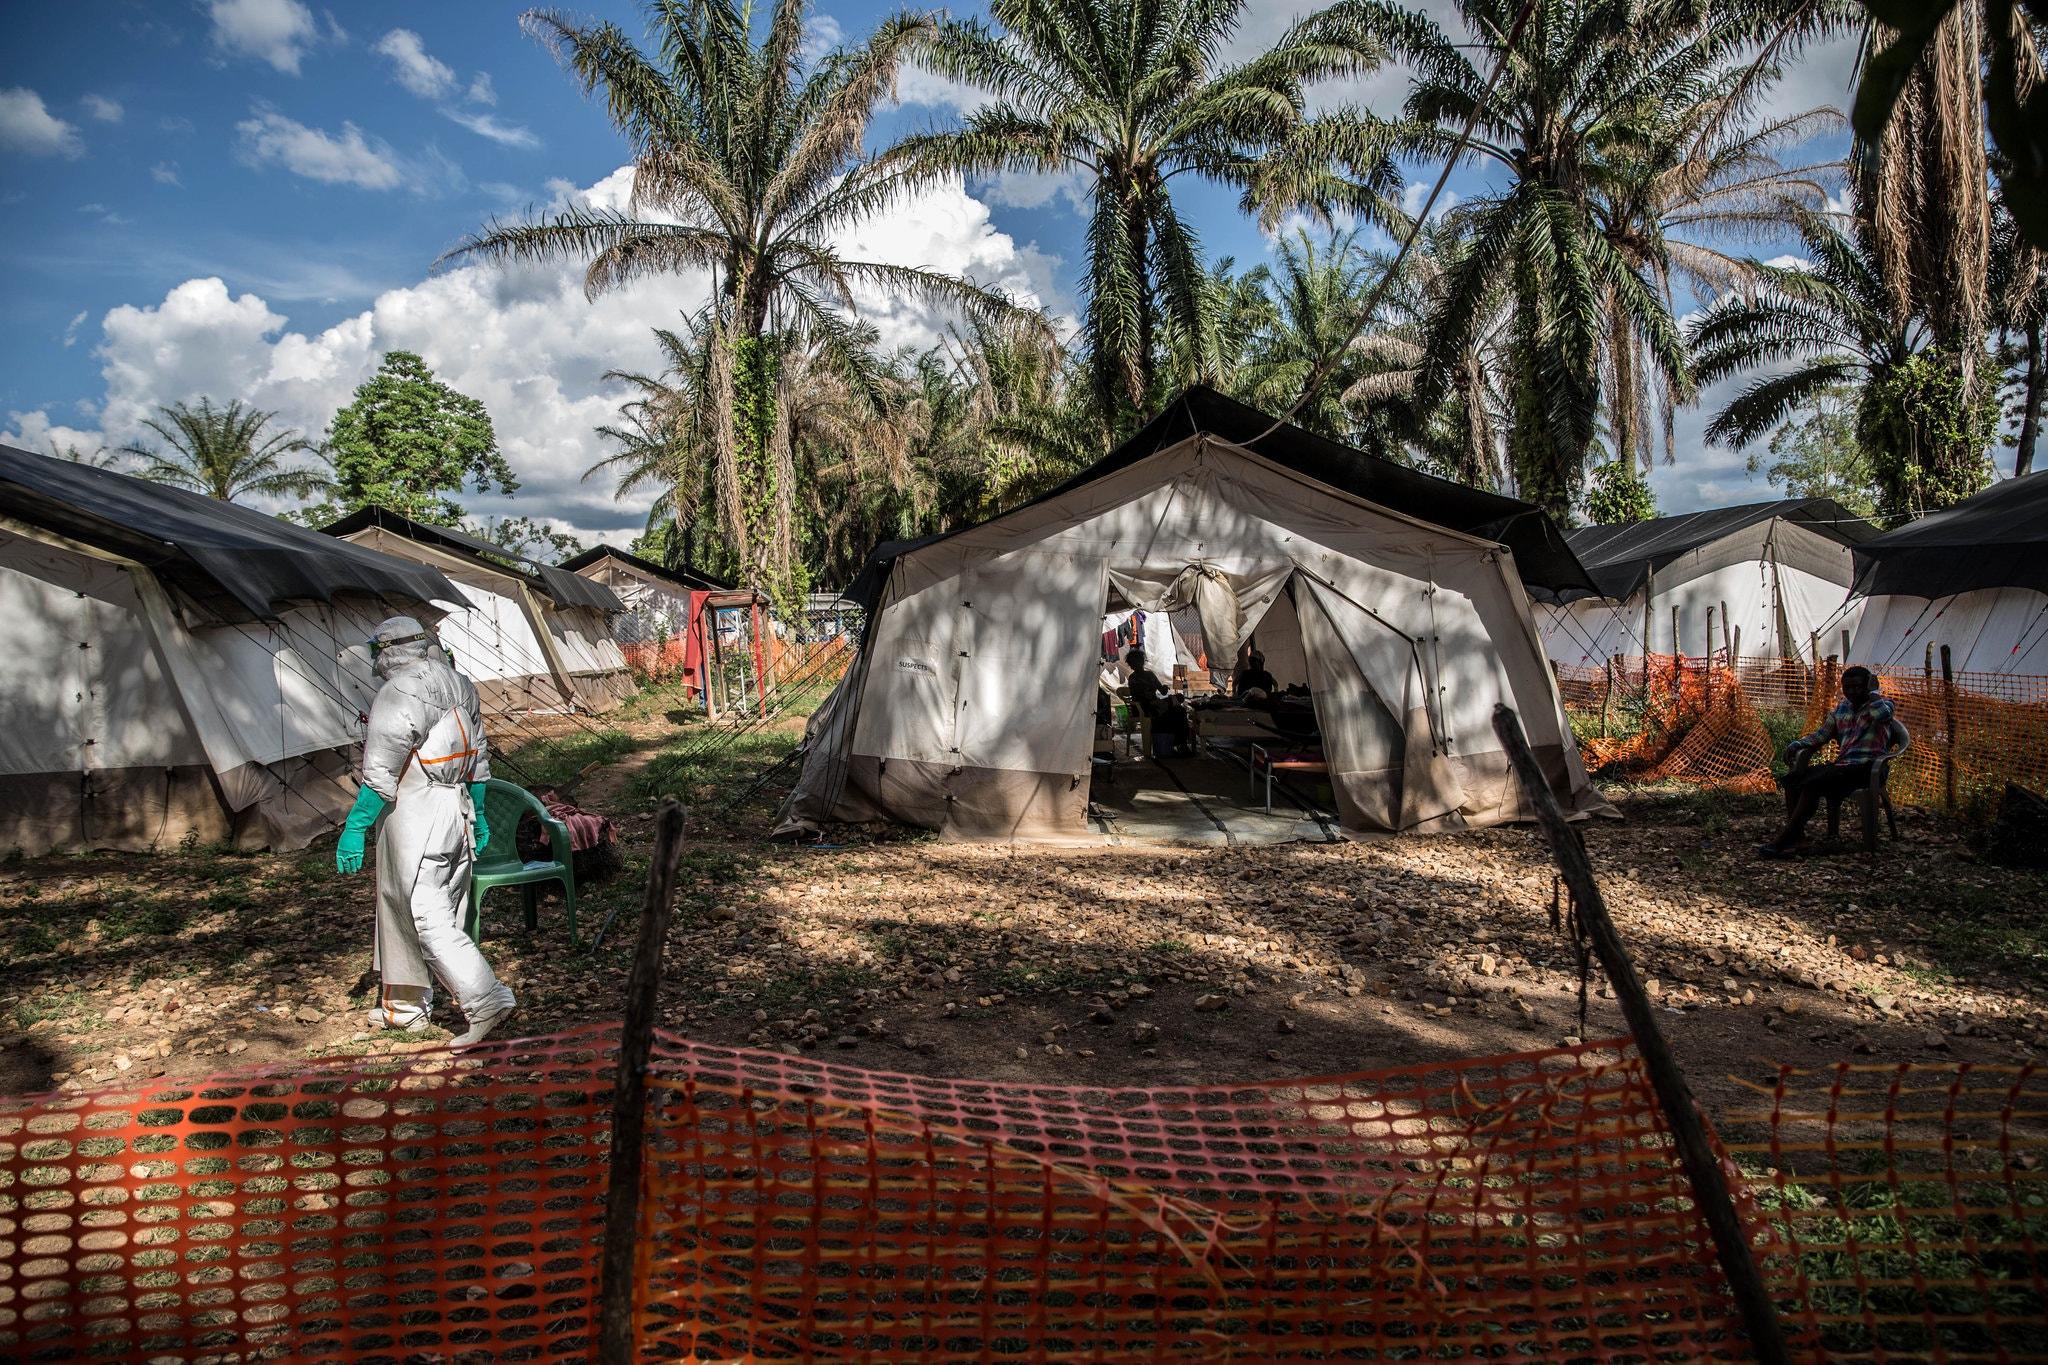 Congo faces new Ebola outbreak - Already 5 dead in Mbandaka - Strange Sounds